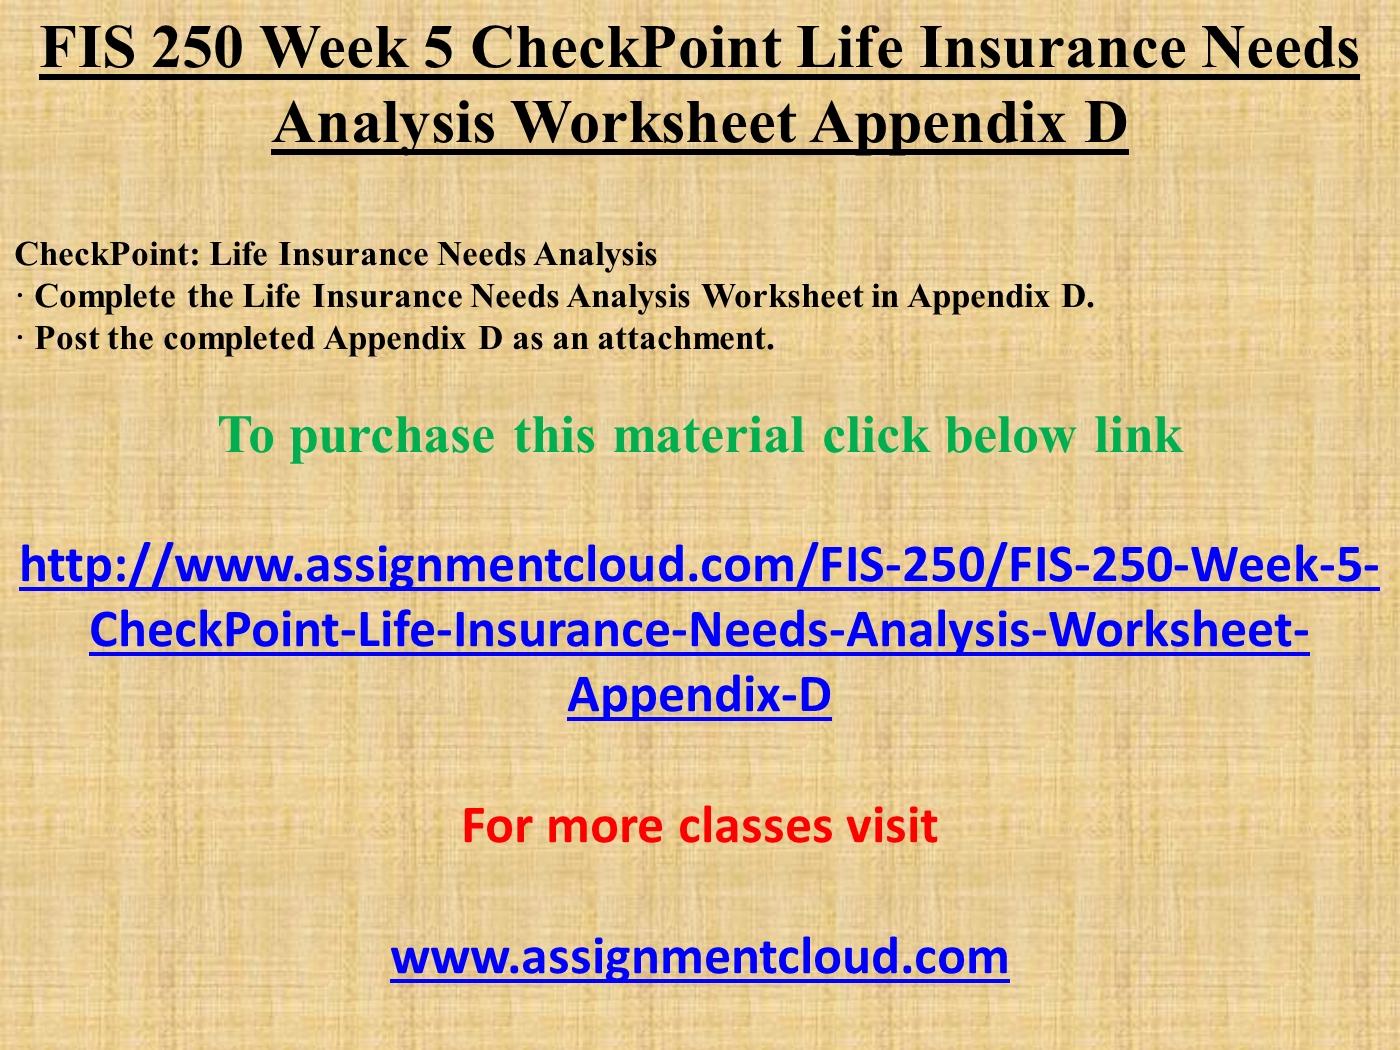 worksheet Life Insurance Needs Analysis Worksheet fis 250 week 5 checkpoint life insurance needs analysis worksheet appendix d powerpoint presentation ppt